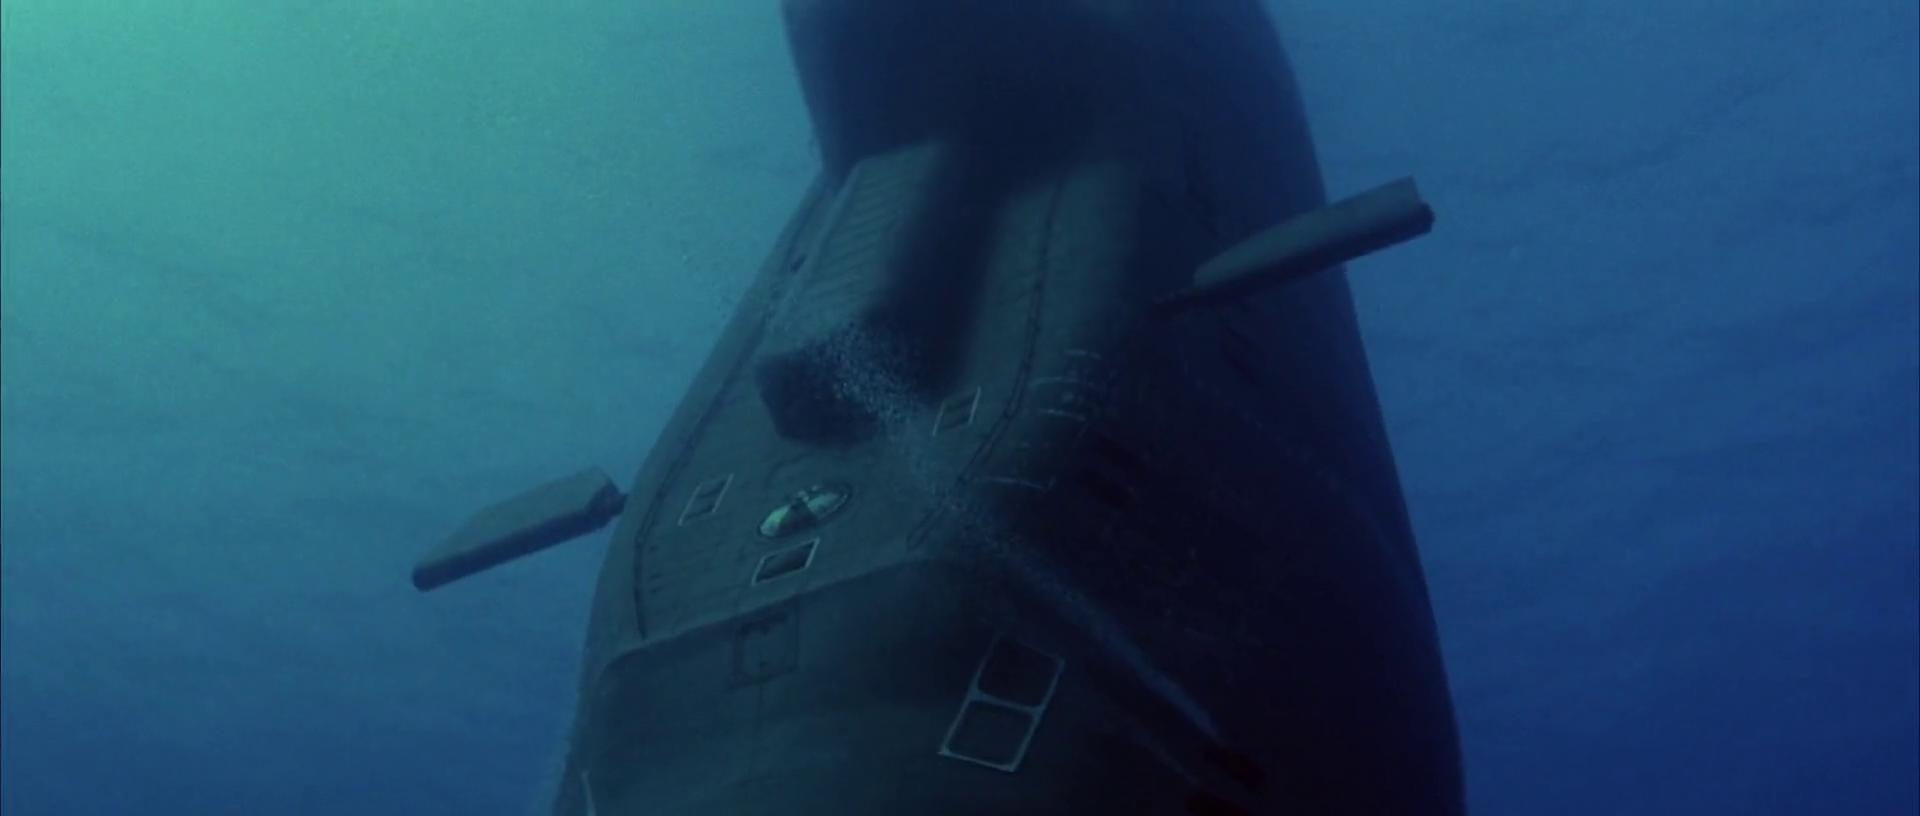 Victor-III class submarine   James Bond Wiki   FANDOM